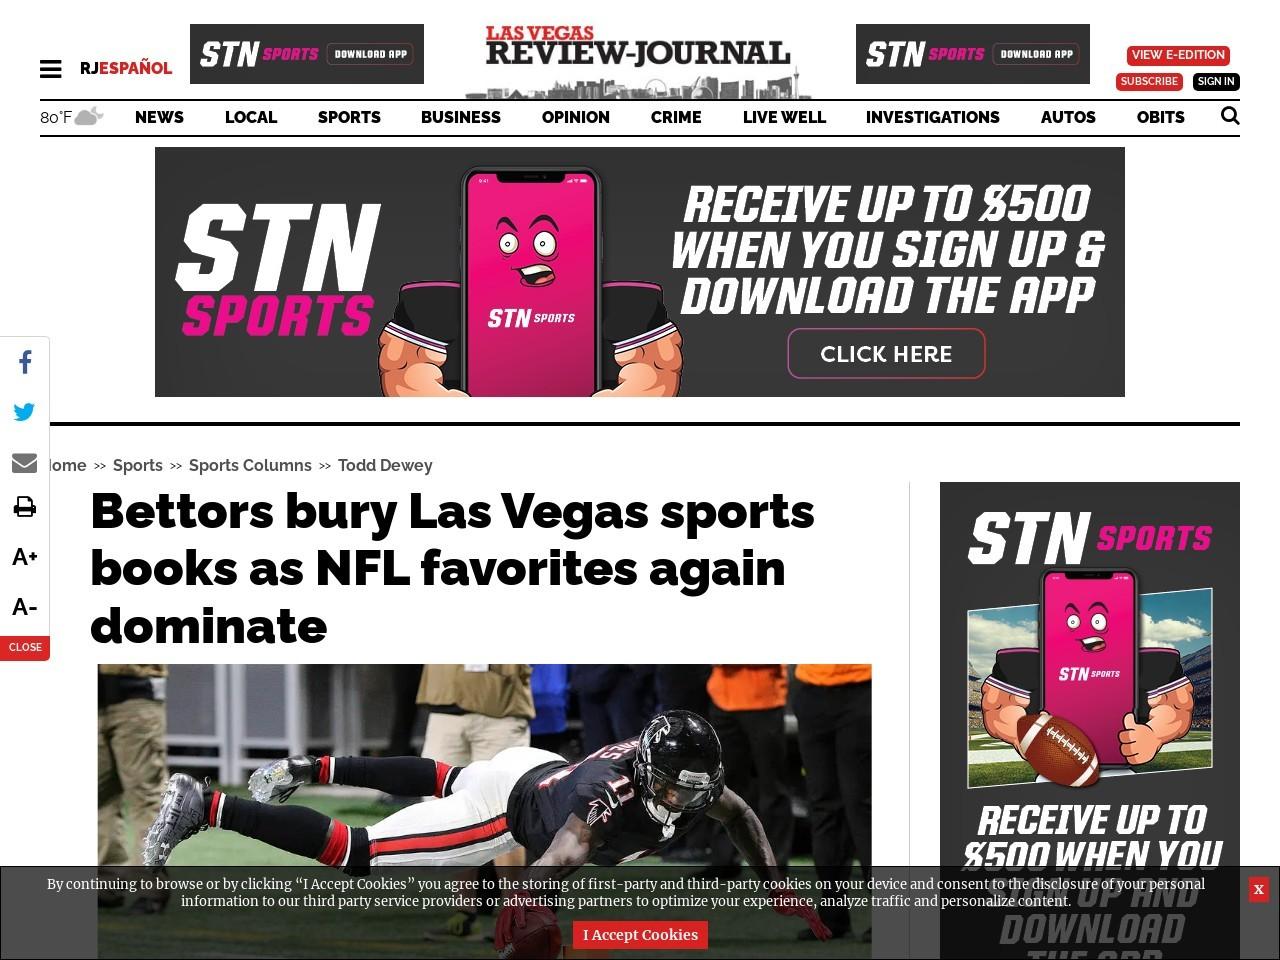 Bettors bury Las Vegas sports books as NFL favorites again dominate